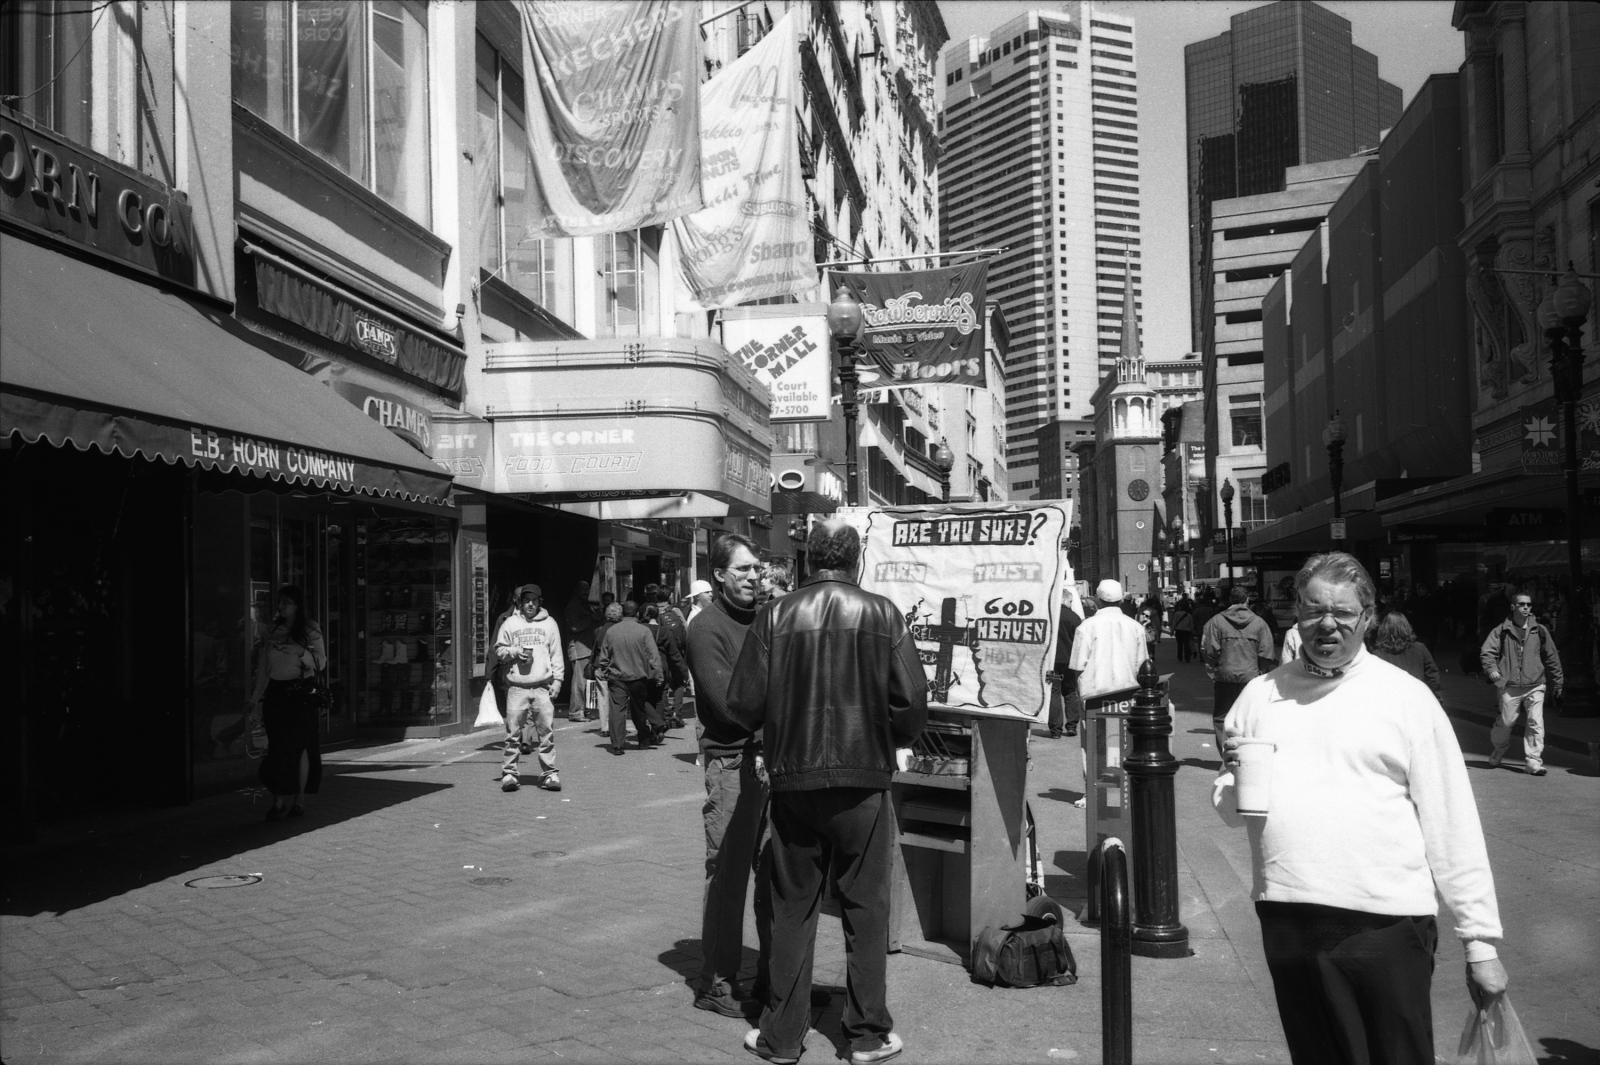 Art and Documentary Photography - Loading Streetpreacheredited_copy.jpg